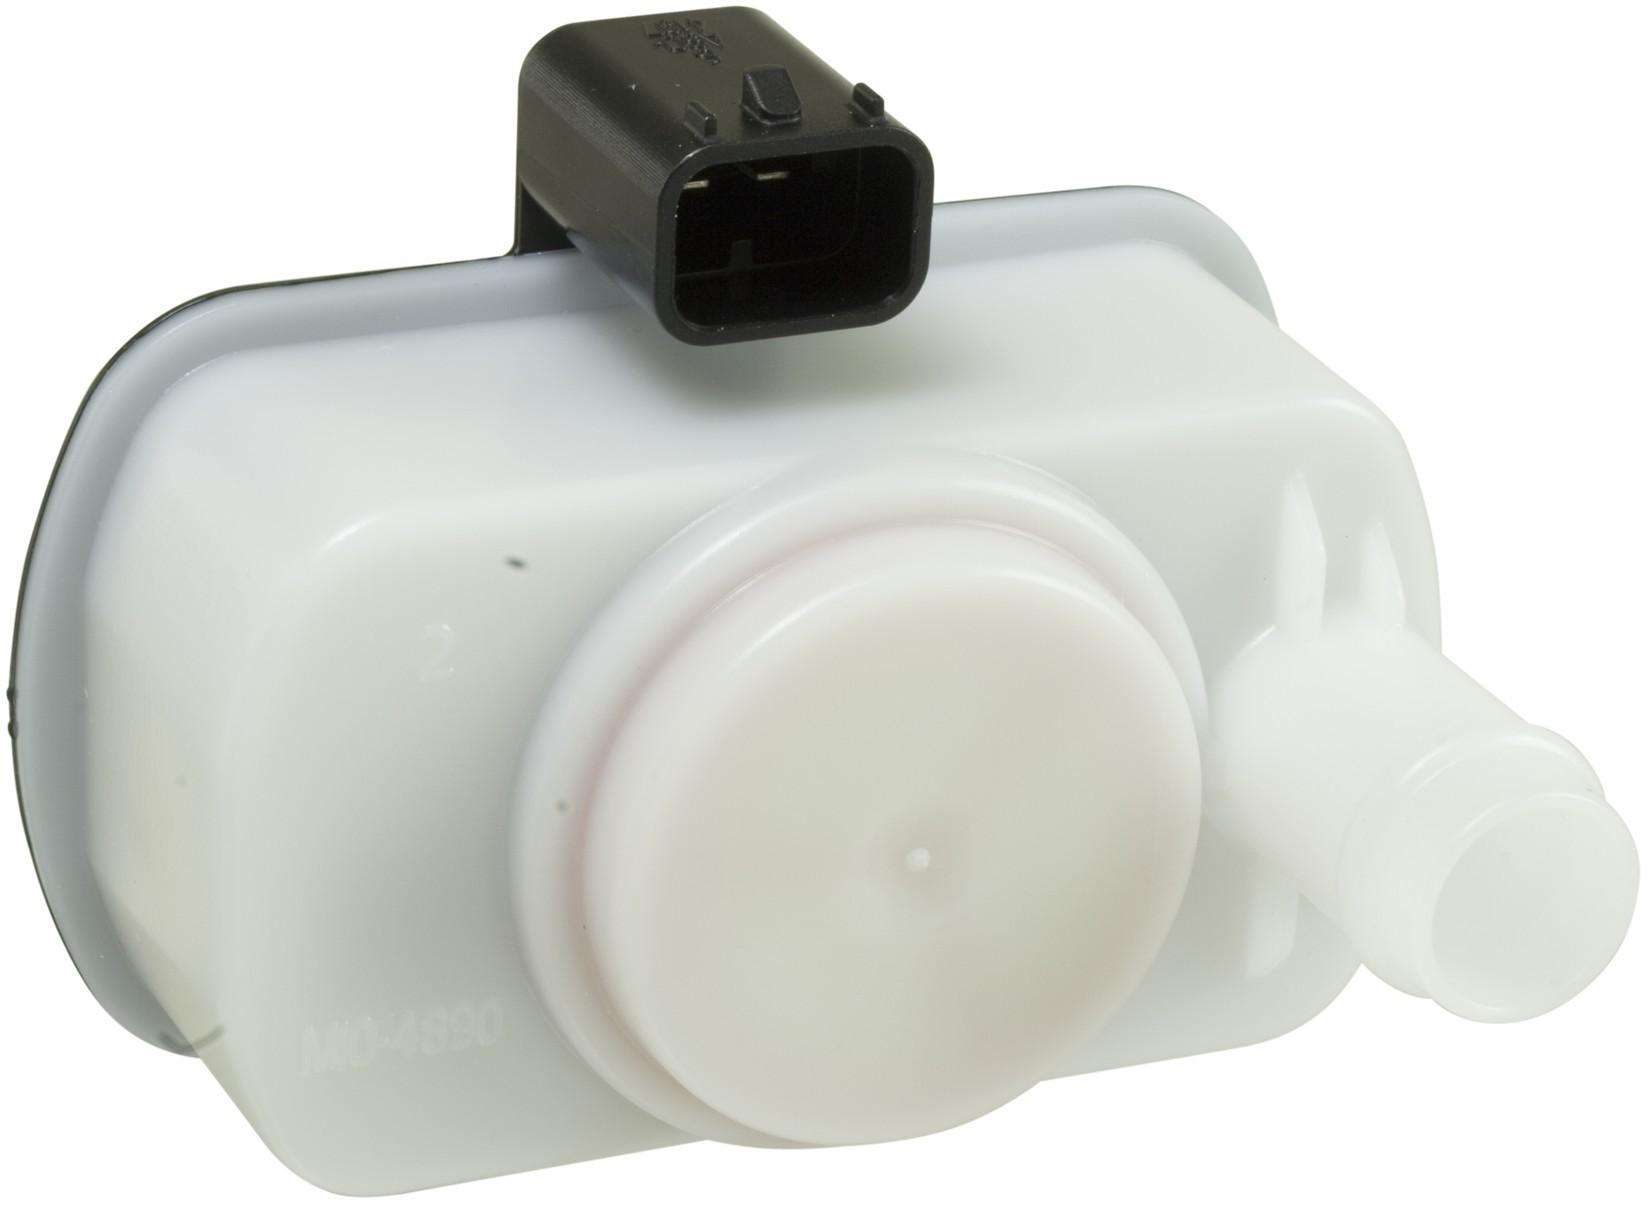 Dodge Dakota Fuel Filter Replacement Wire 2002 Caravan Evap Canister Location 2007 Caliber Get Free 2000